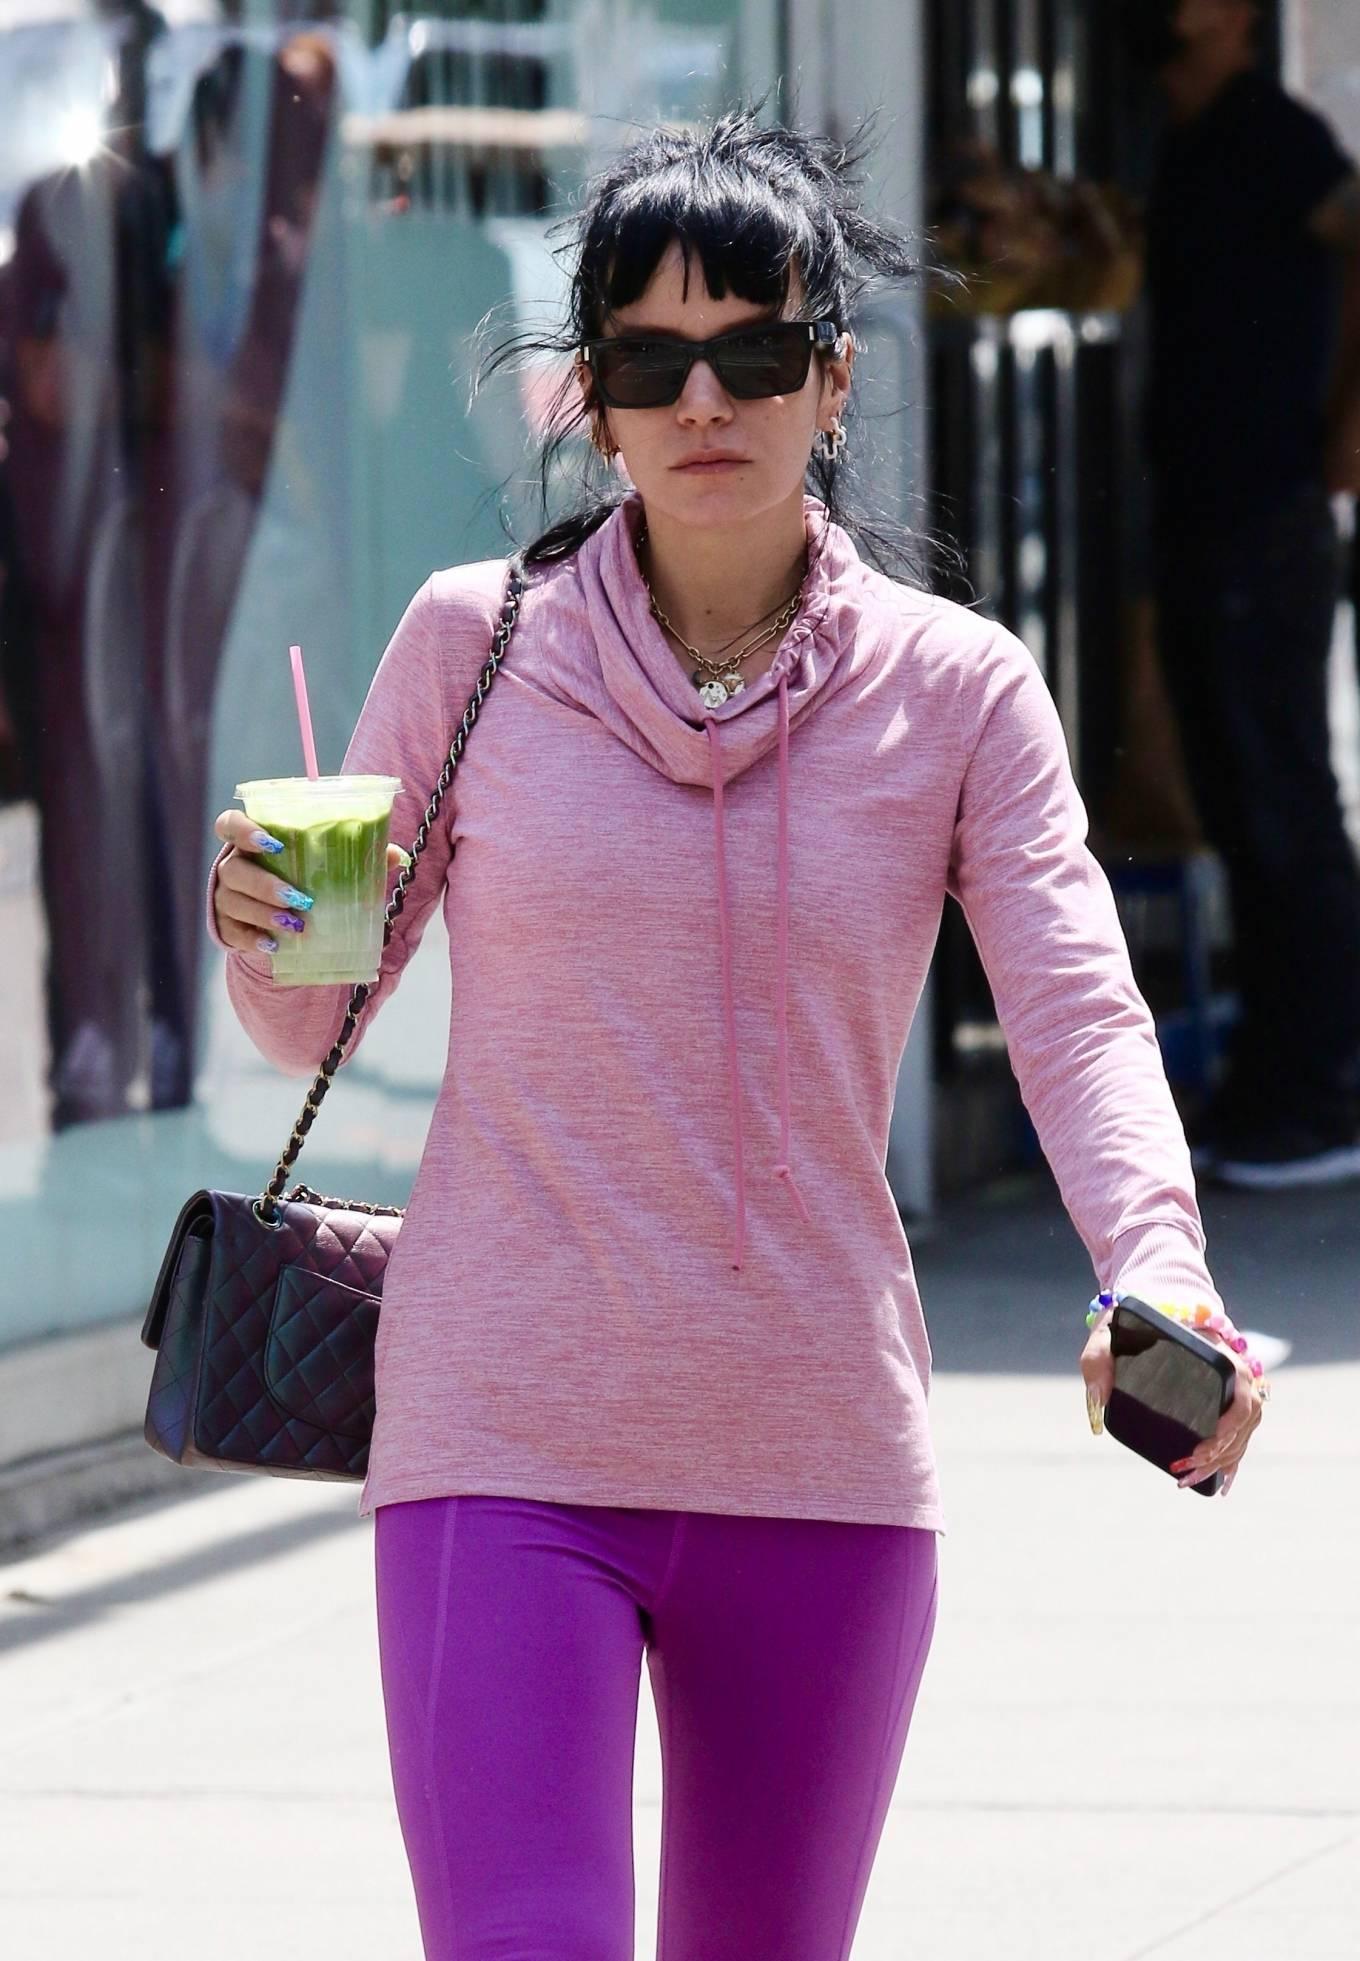 Lily Allen 2021 : Lily Allen – In a purple leggings out in Manhattan's Soho area-07